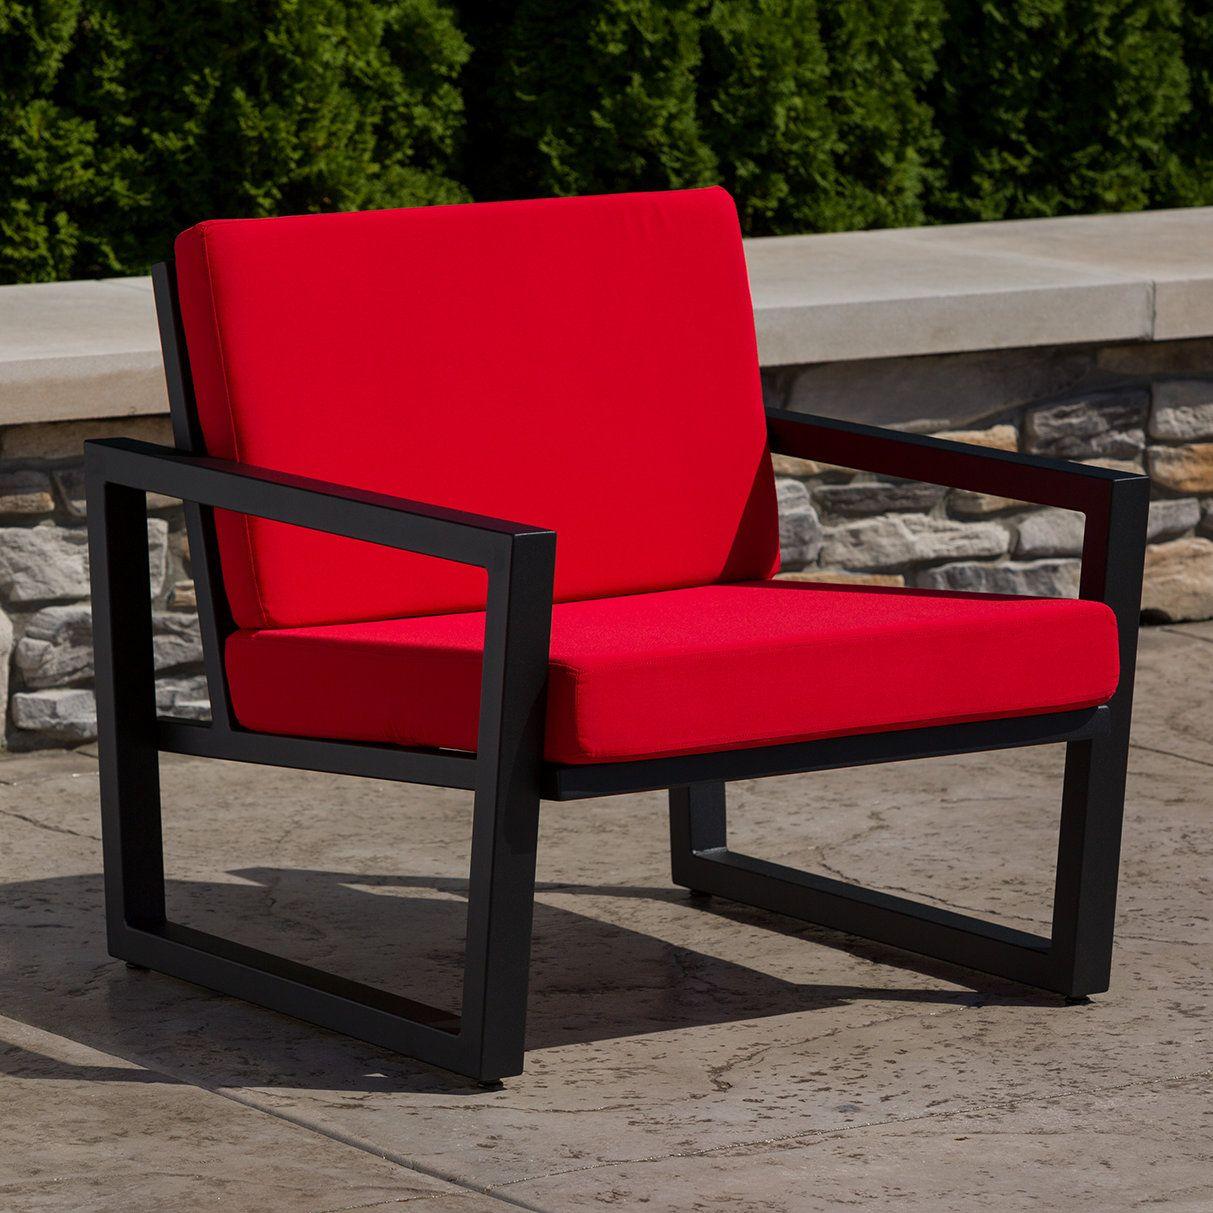 Vero Lounge Chair Wood patio chairs, Patio chairs